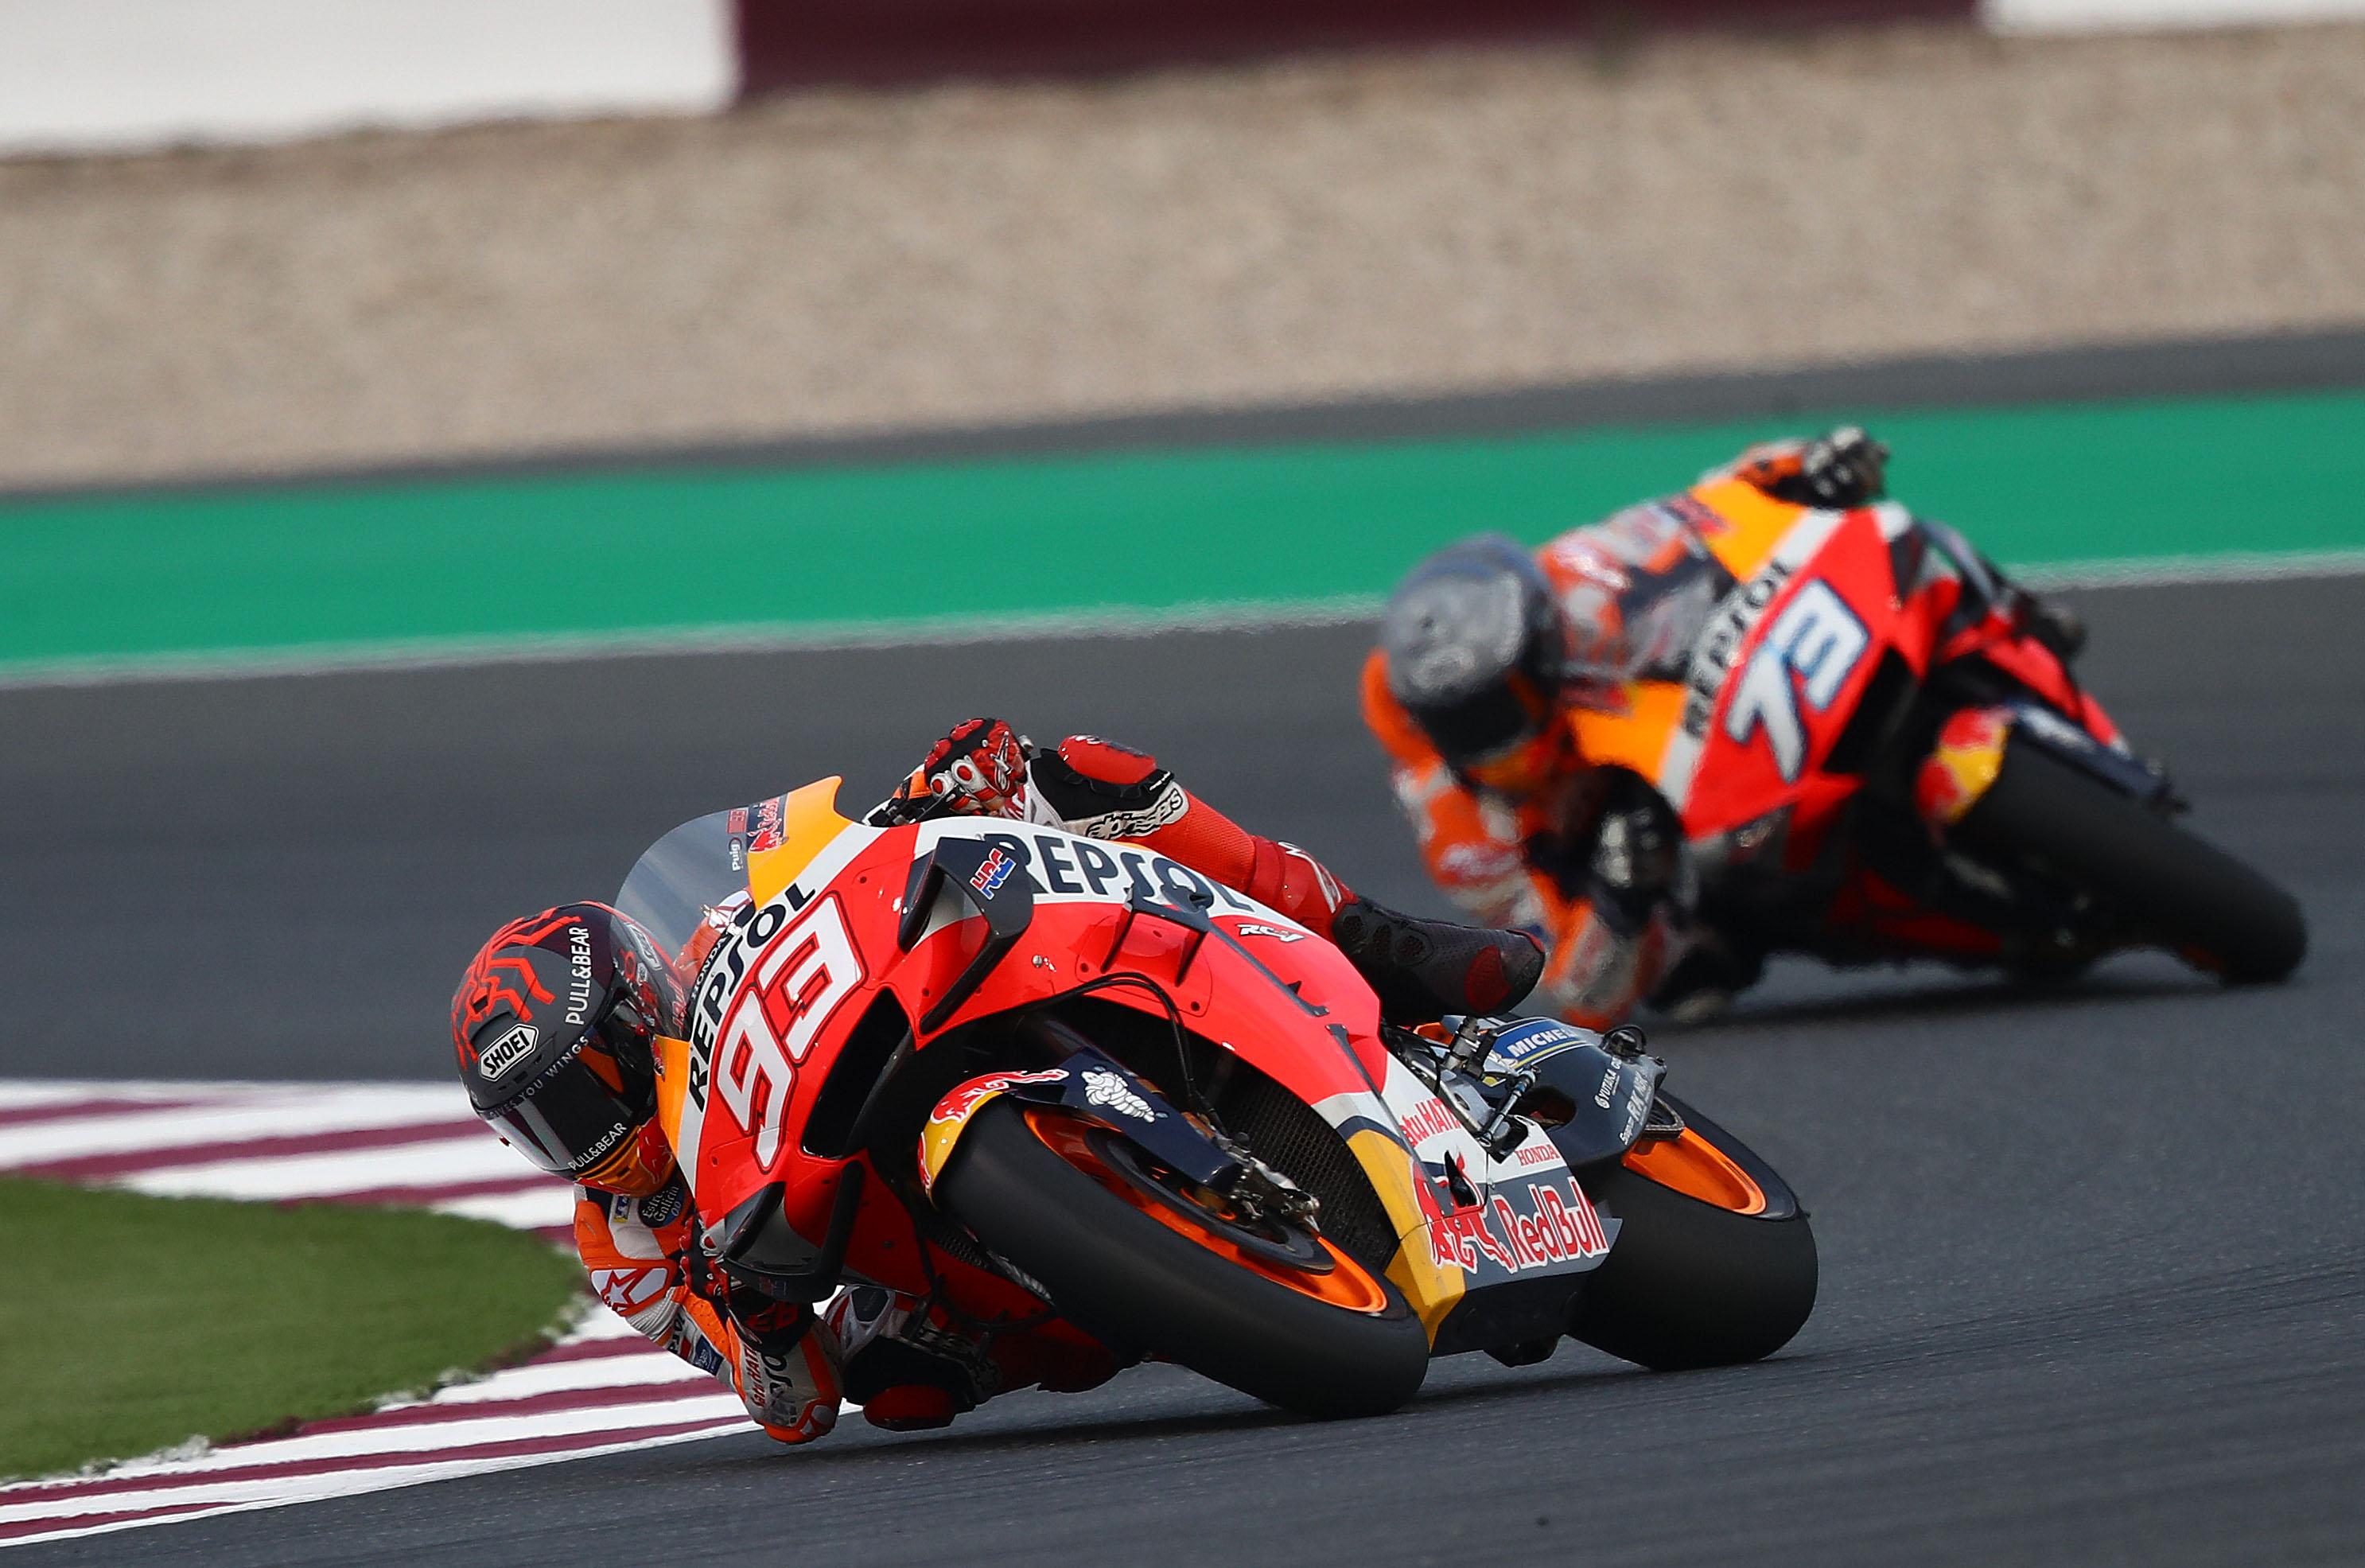 Marc Marquez Alex Marquez Honda Qatar MotoGP testing 2020